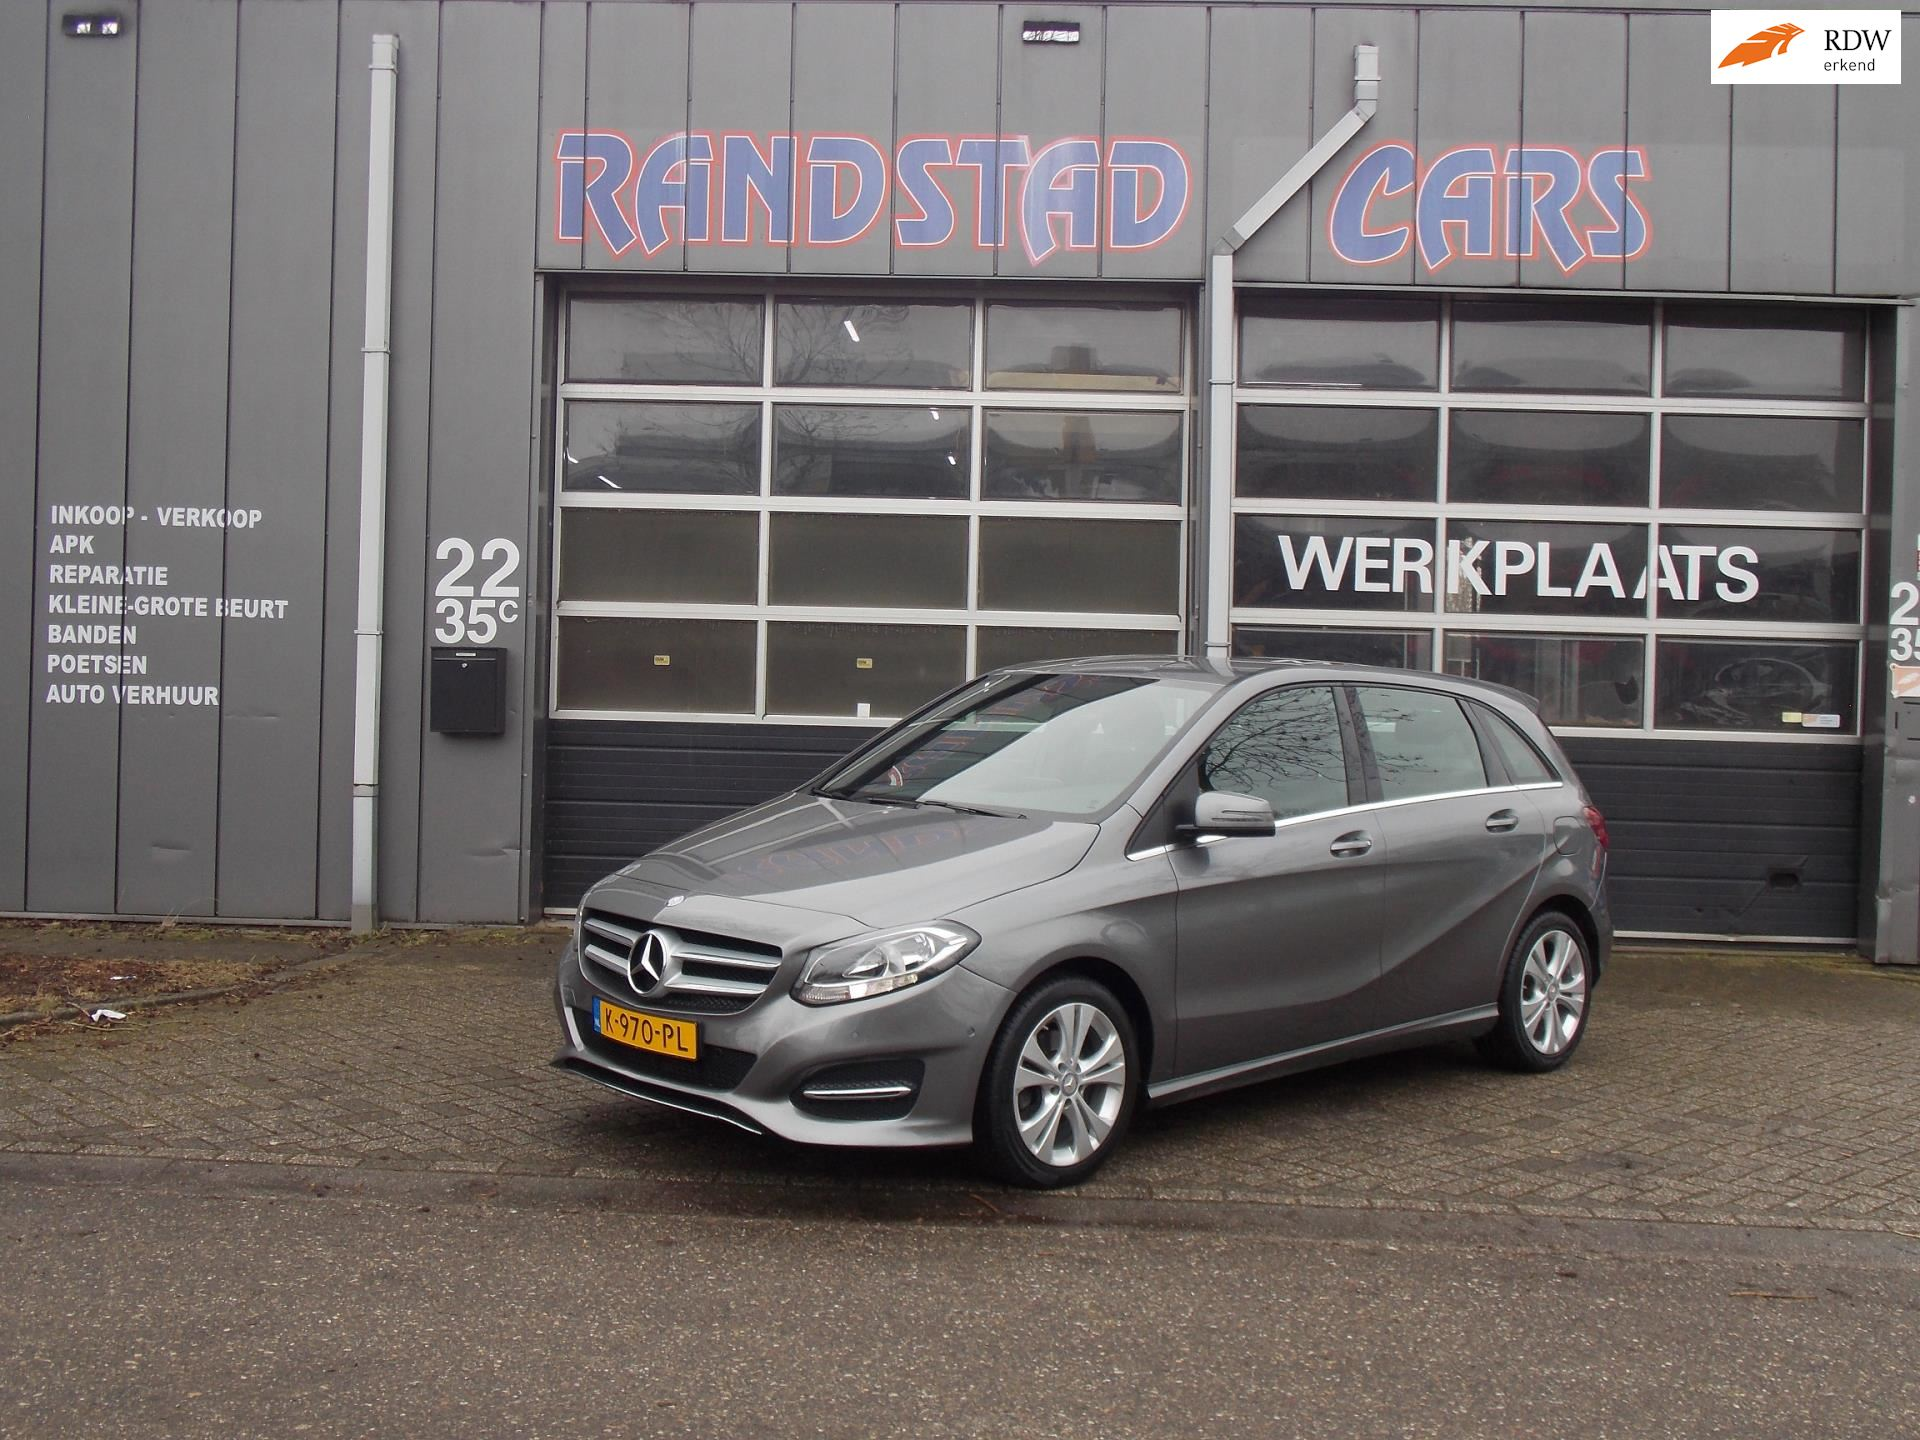 Mercedes-Benz B-klasse occasion - Randstad Cars